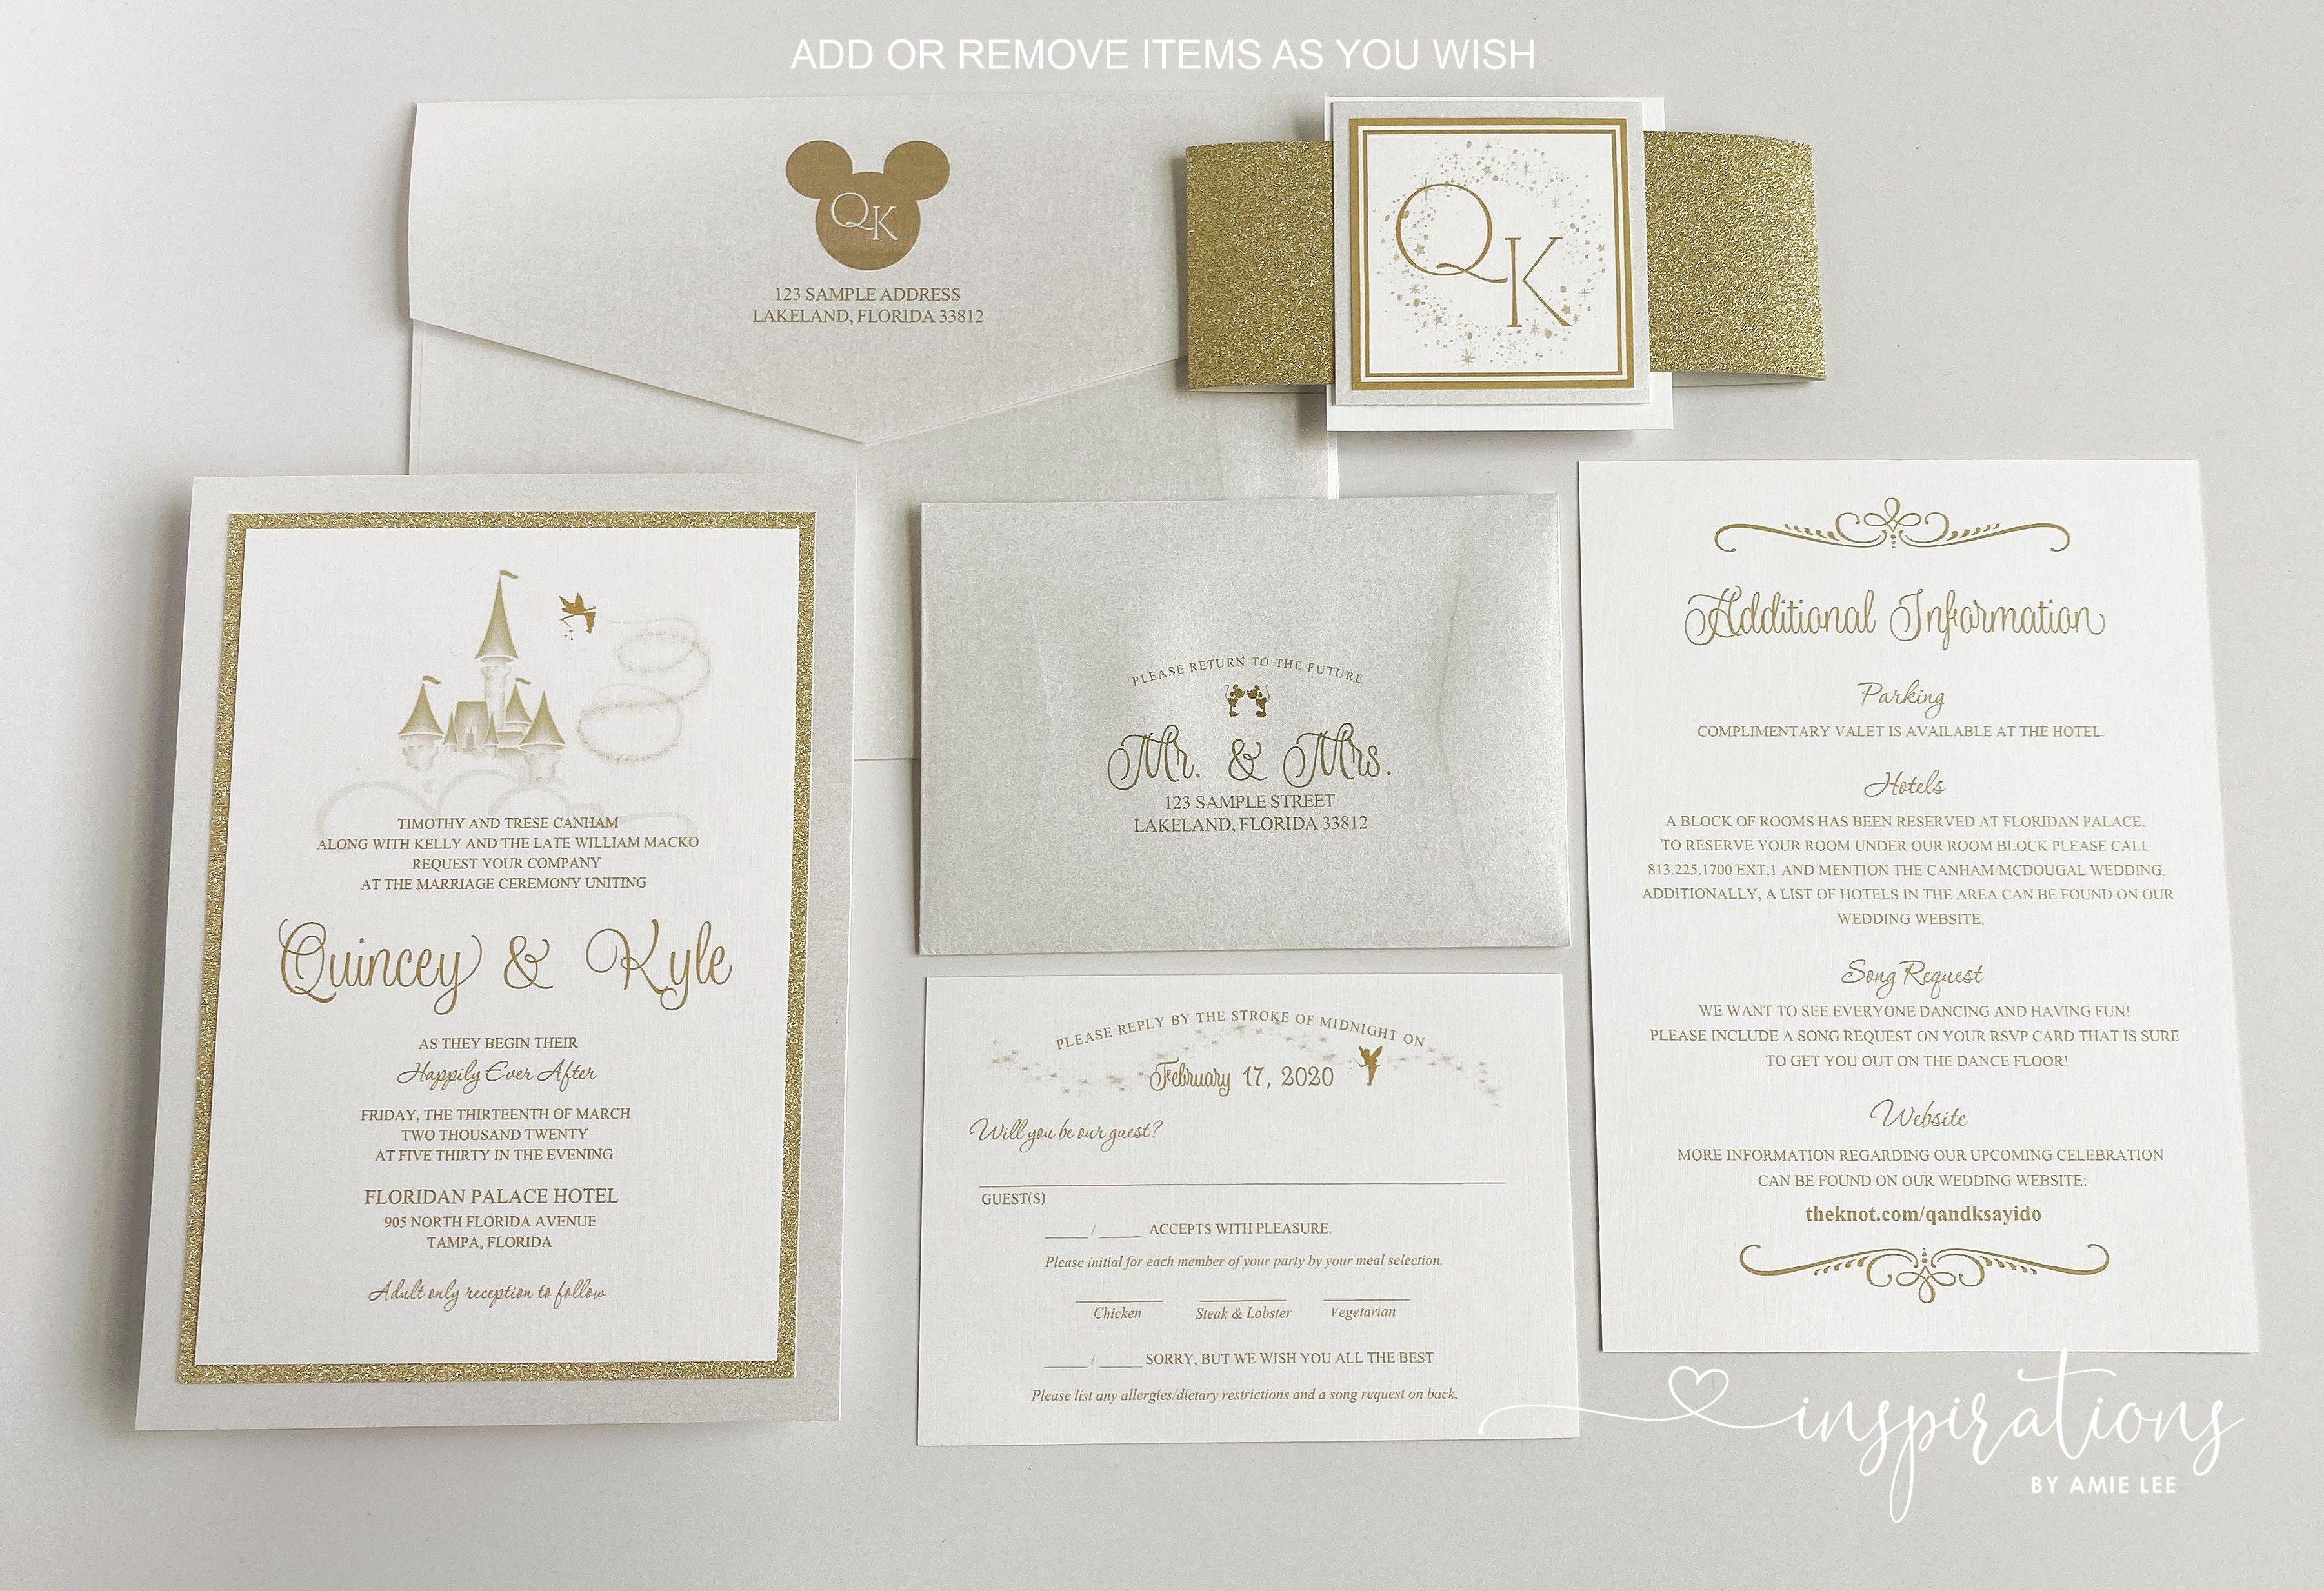 Elegant Disney Wedding Invitations Fairy Tale Wedding Etsy Disney Wedding Invitations Wedding Invitation Templates Wedding Invitations